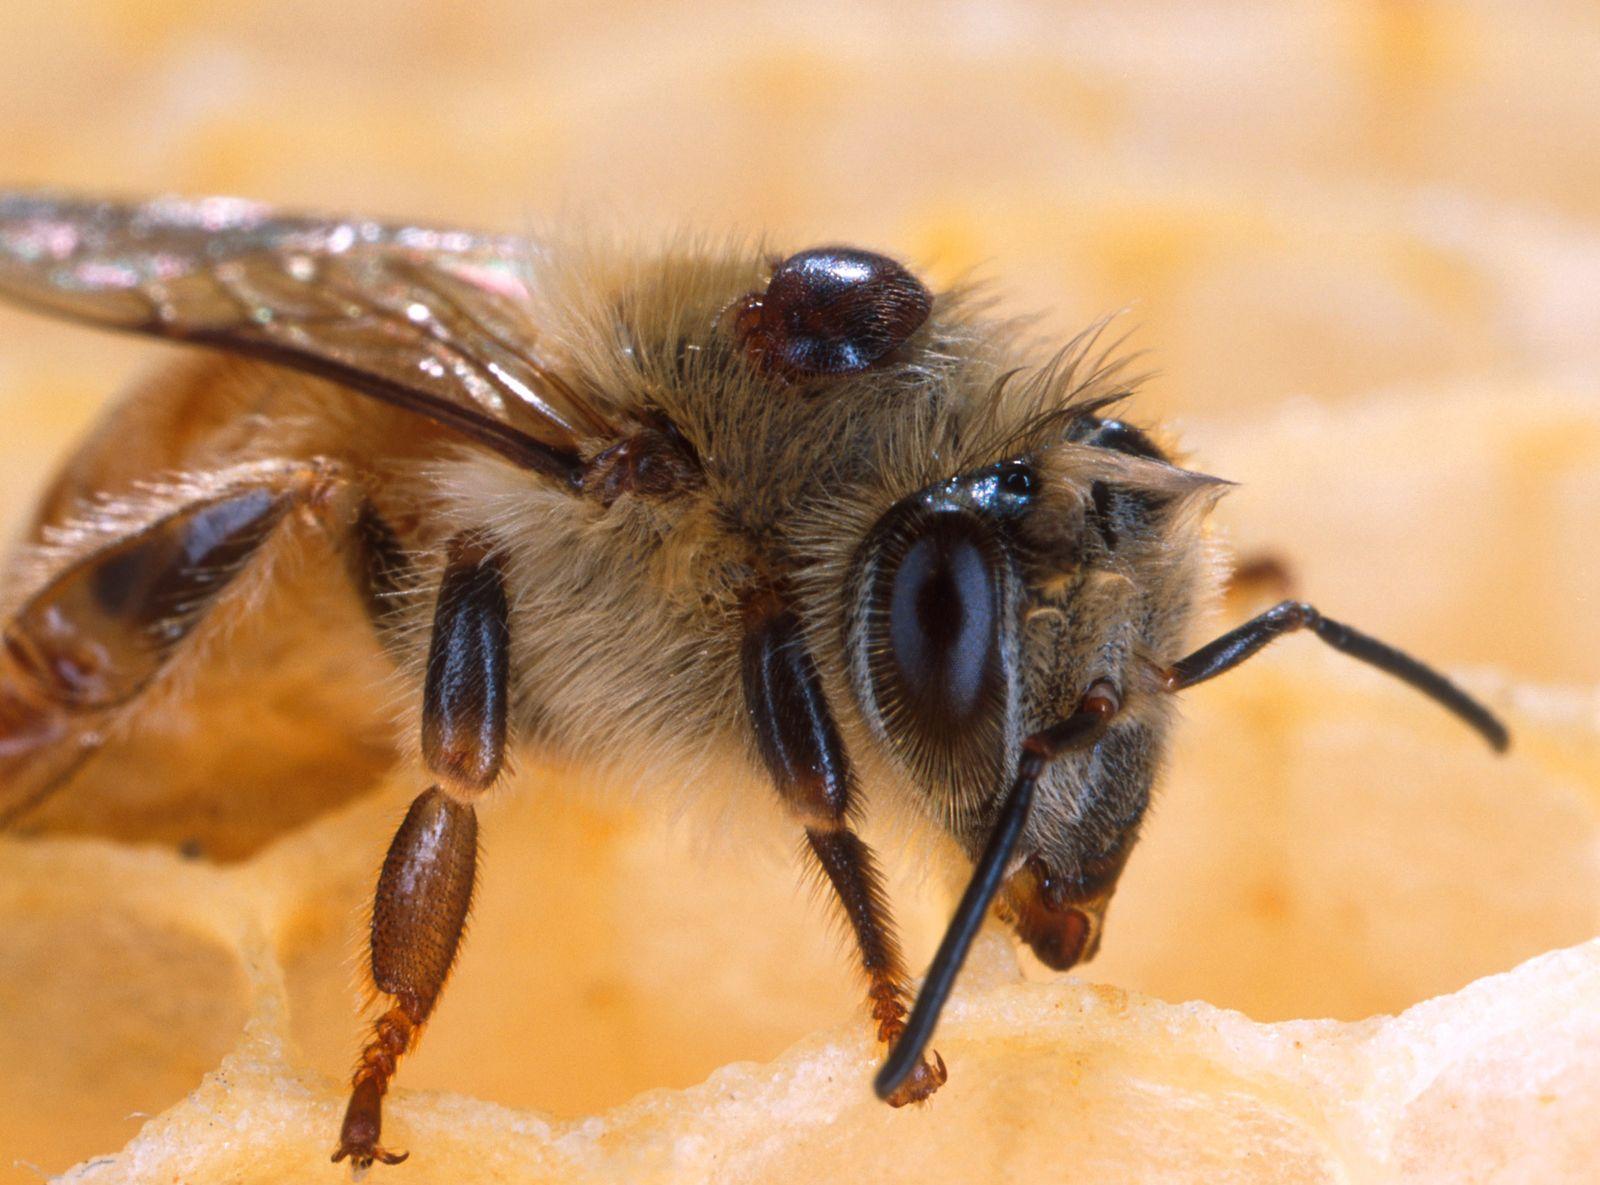 Biene / Parasit / Varroa Milbe